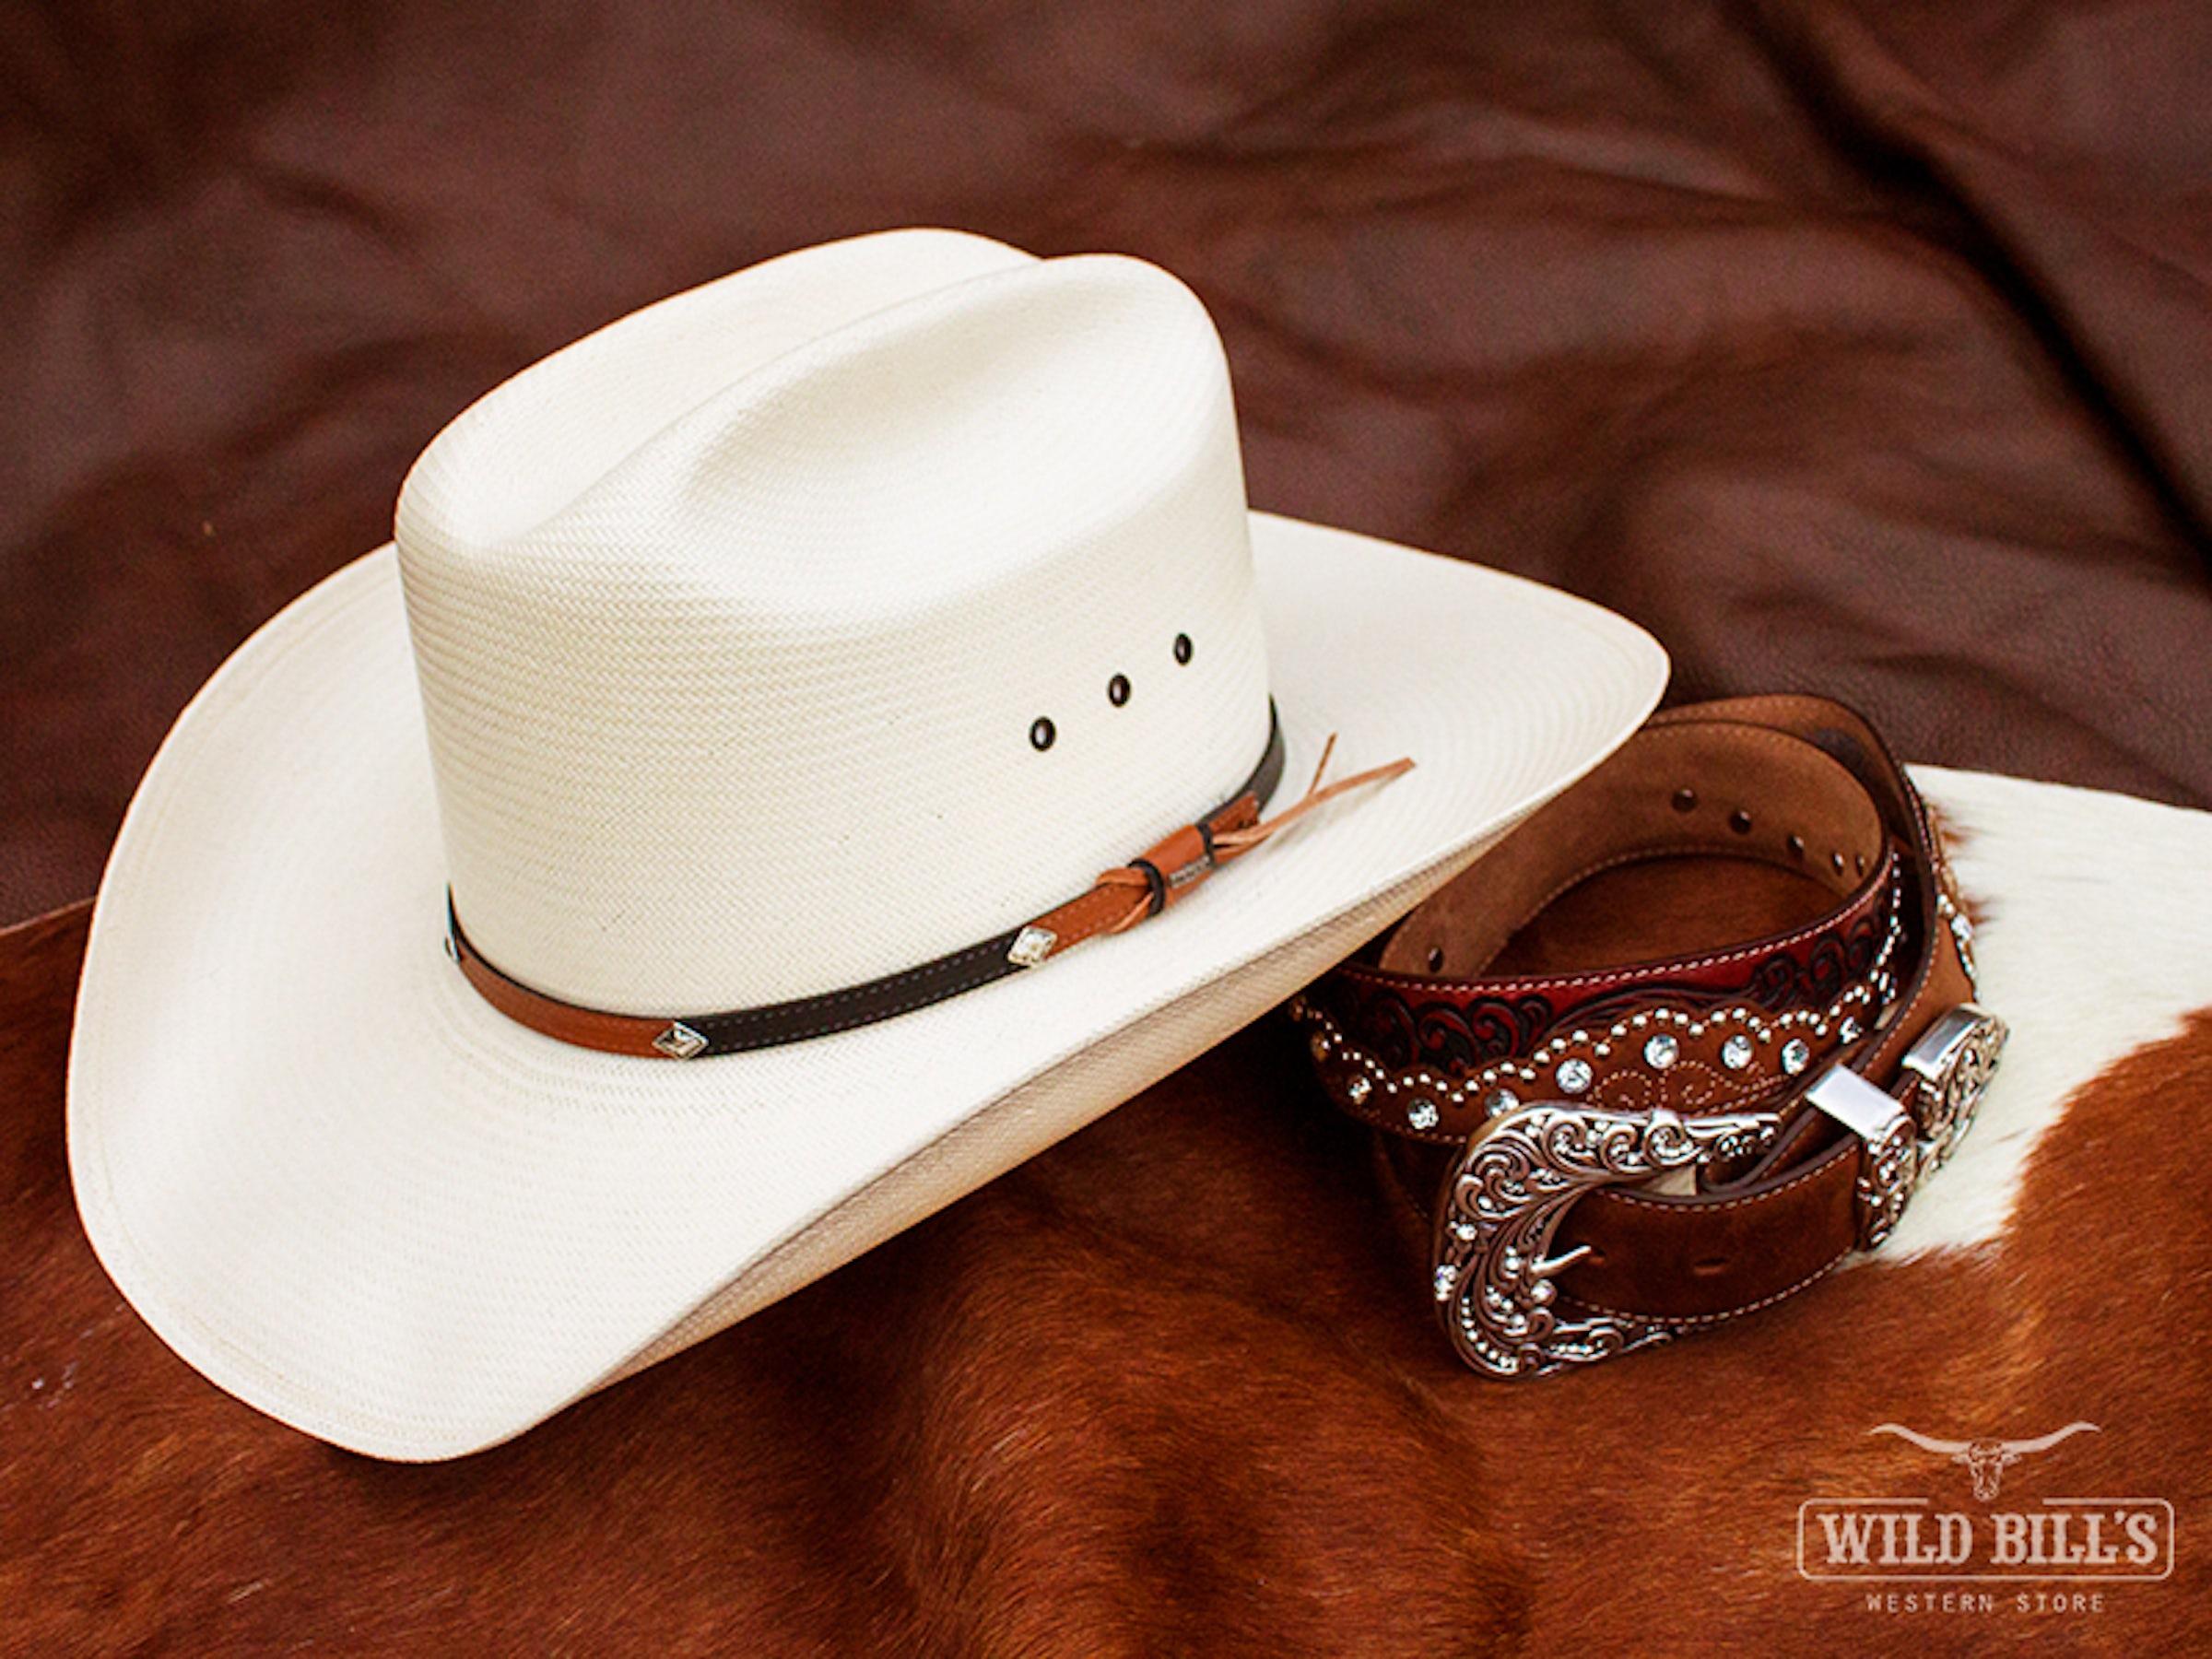 Wild Bill's Western Store in Beyond Dallas